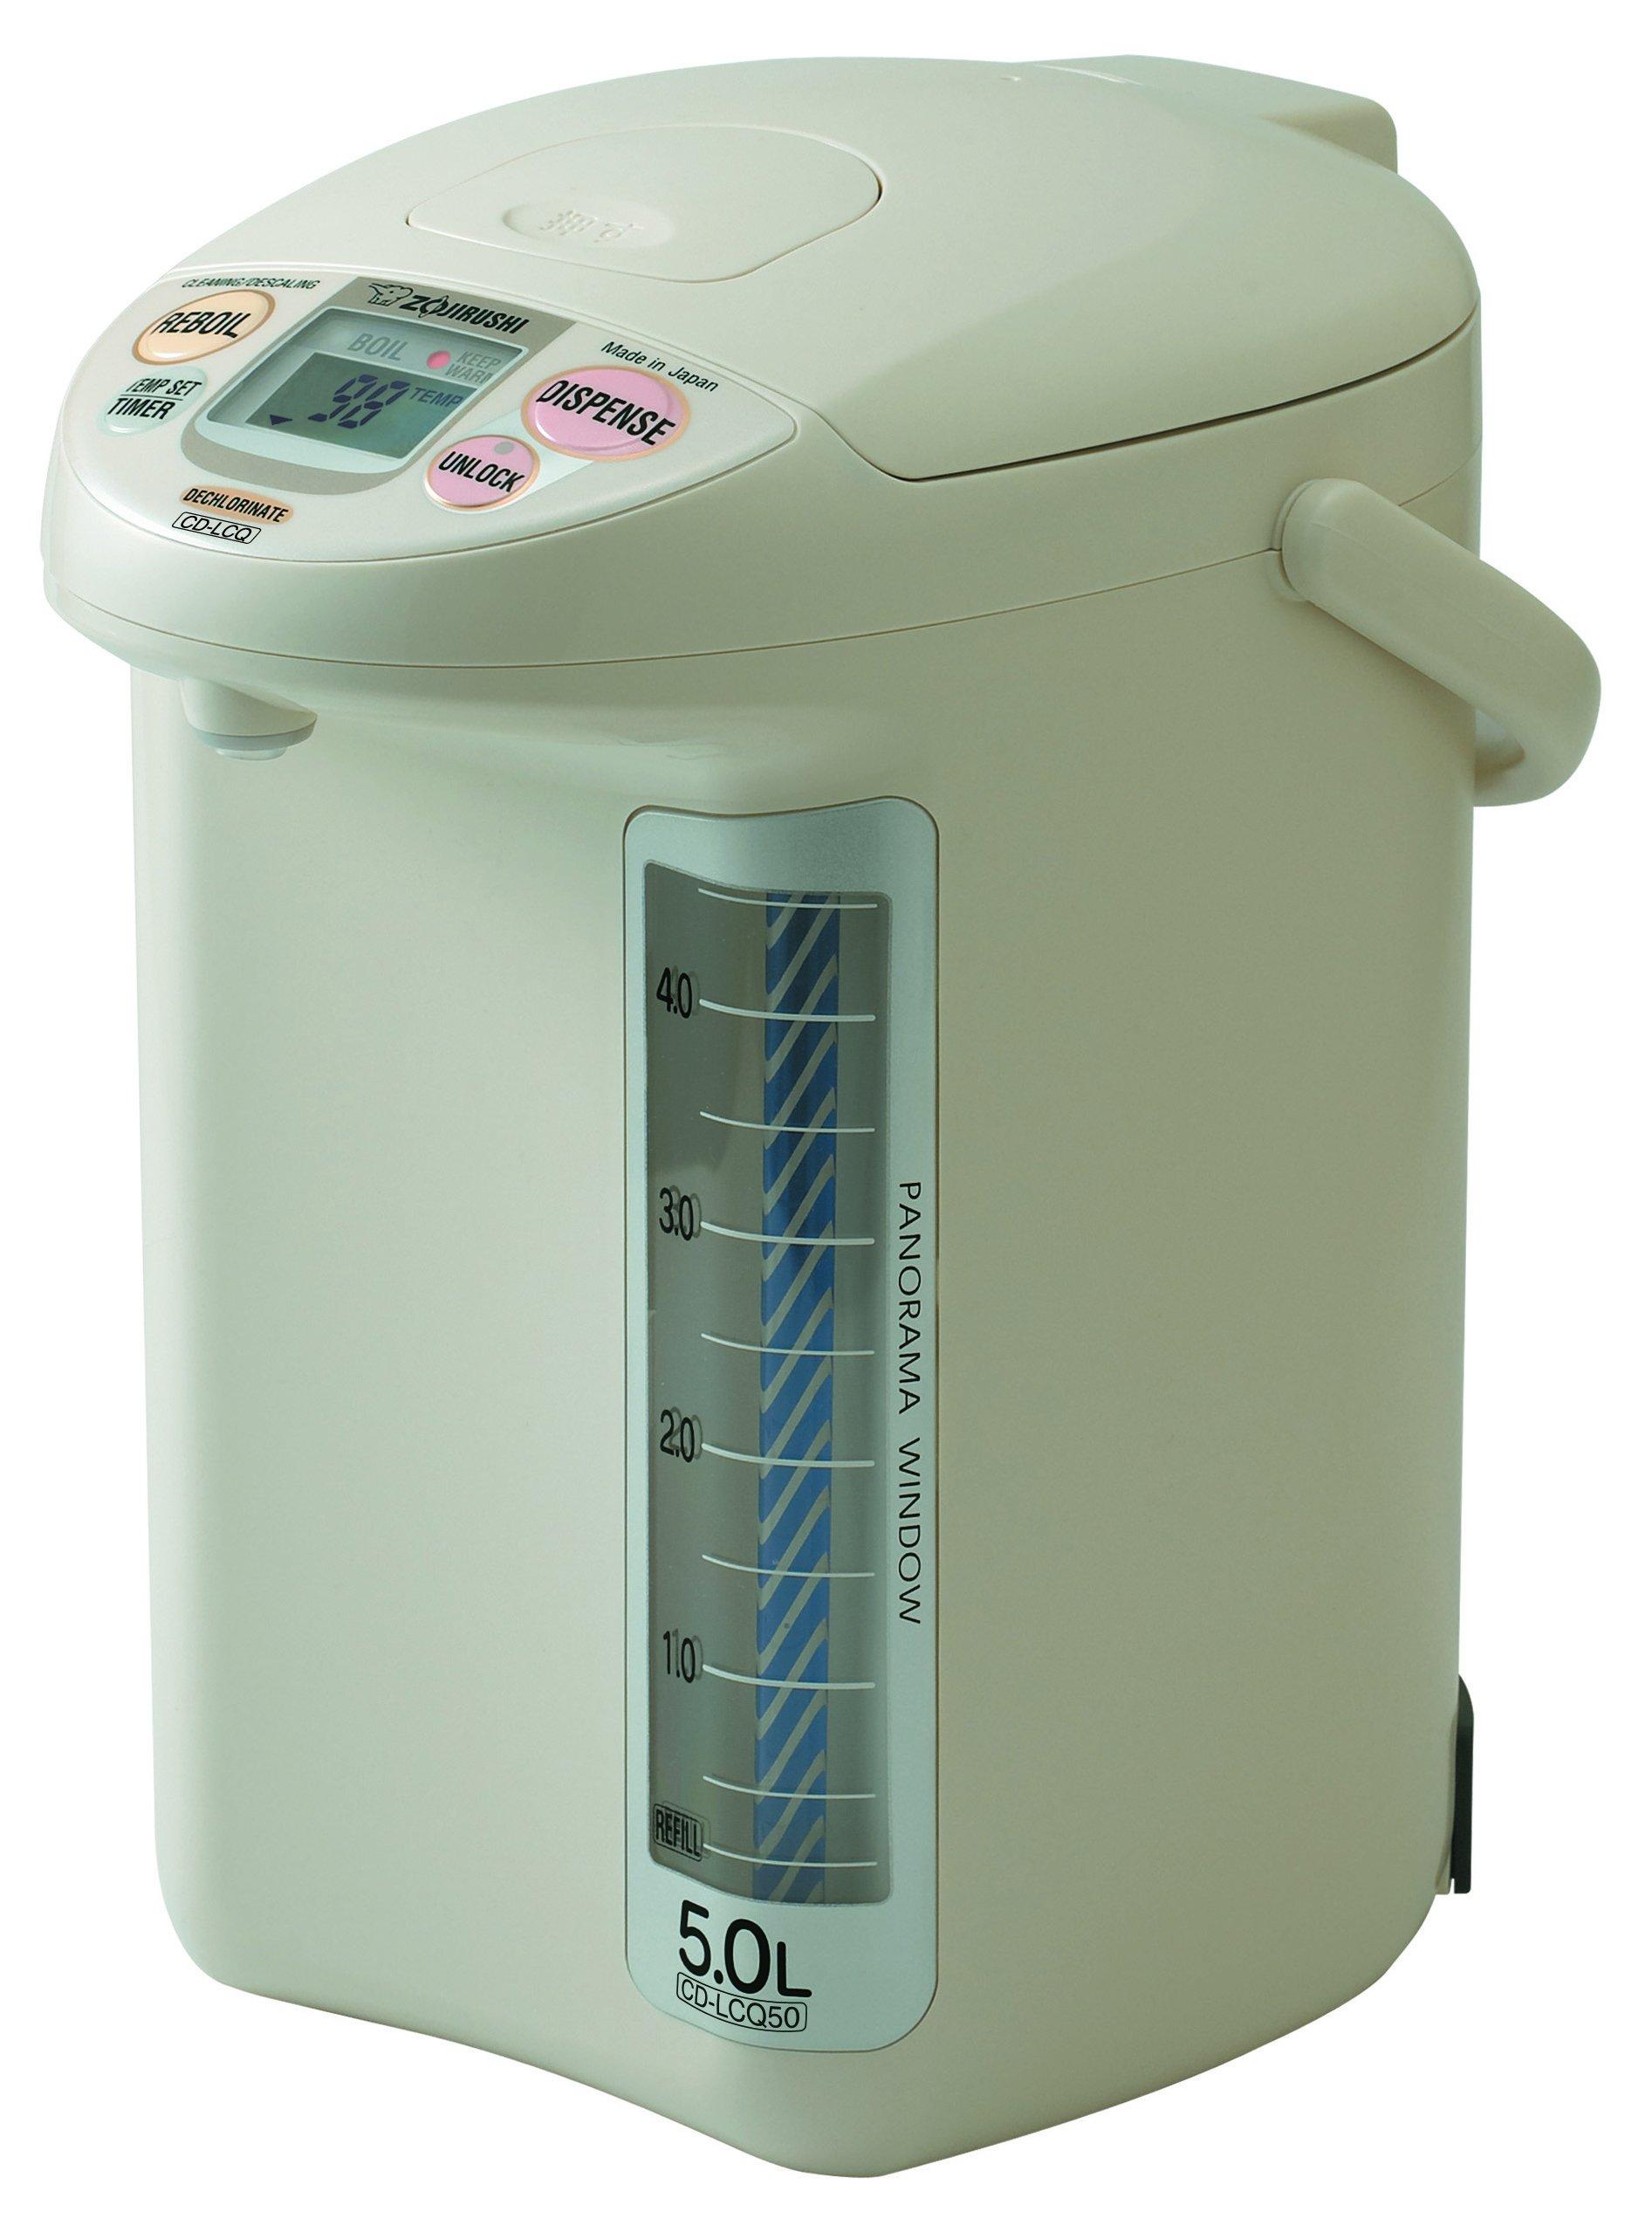 Zojirushi Microcomputer Type Electric Hot Water Pot Cd-lcq50-wg (Ac220-230v)